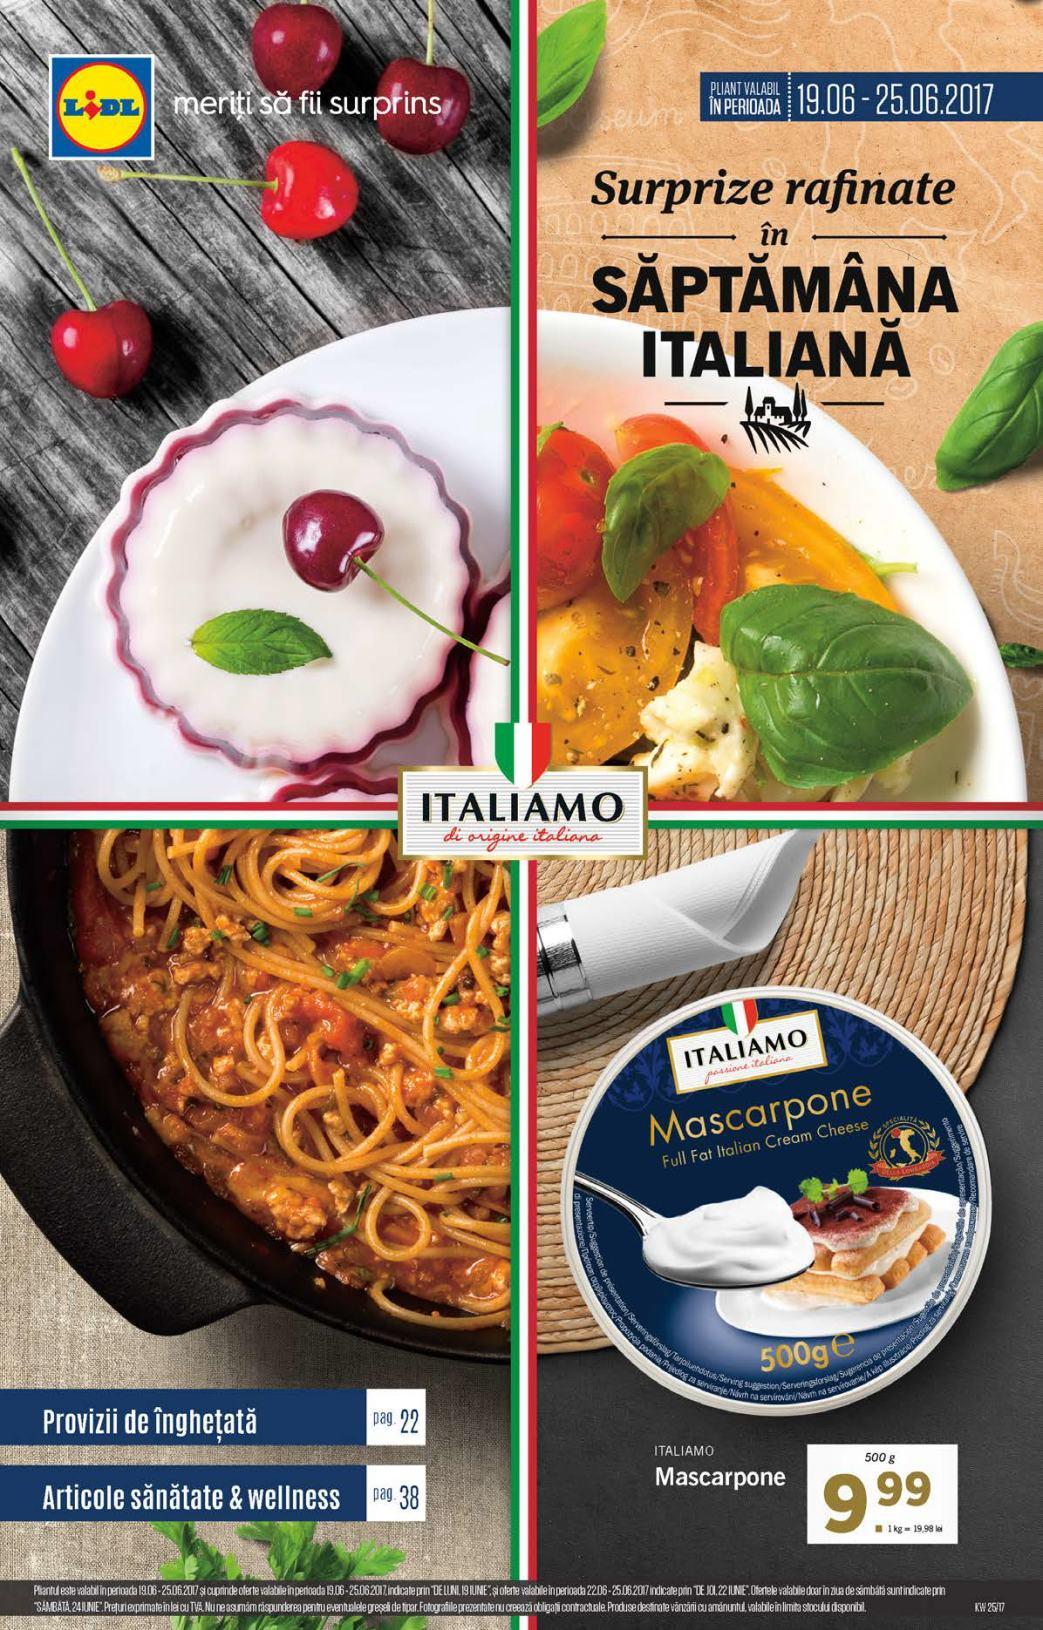 Saptamana italiana lidl 2020